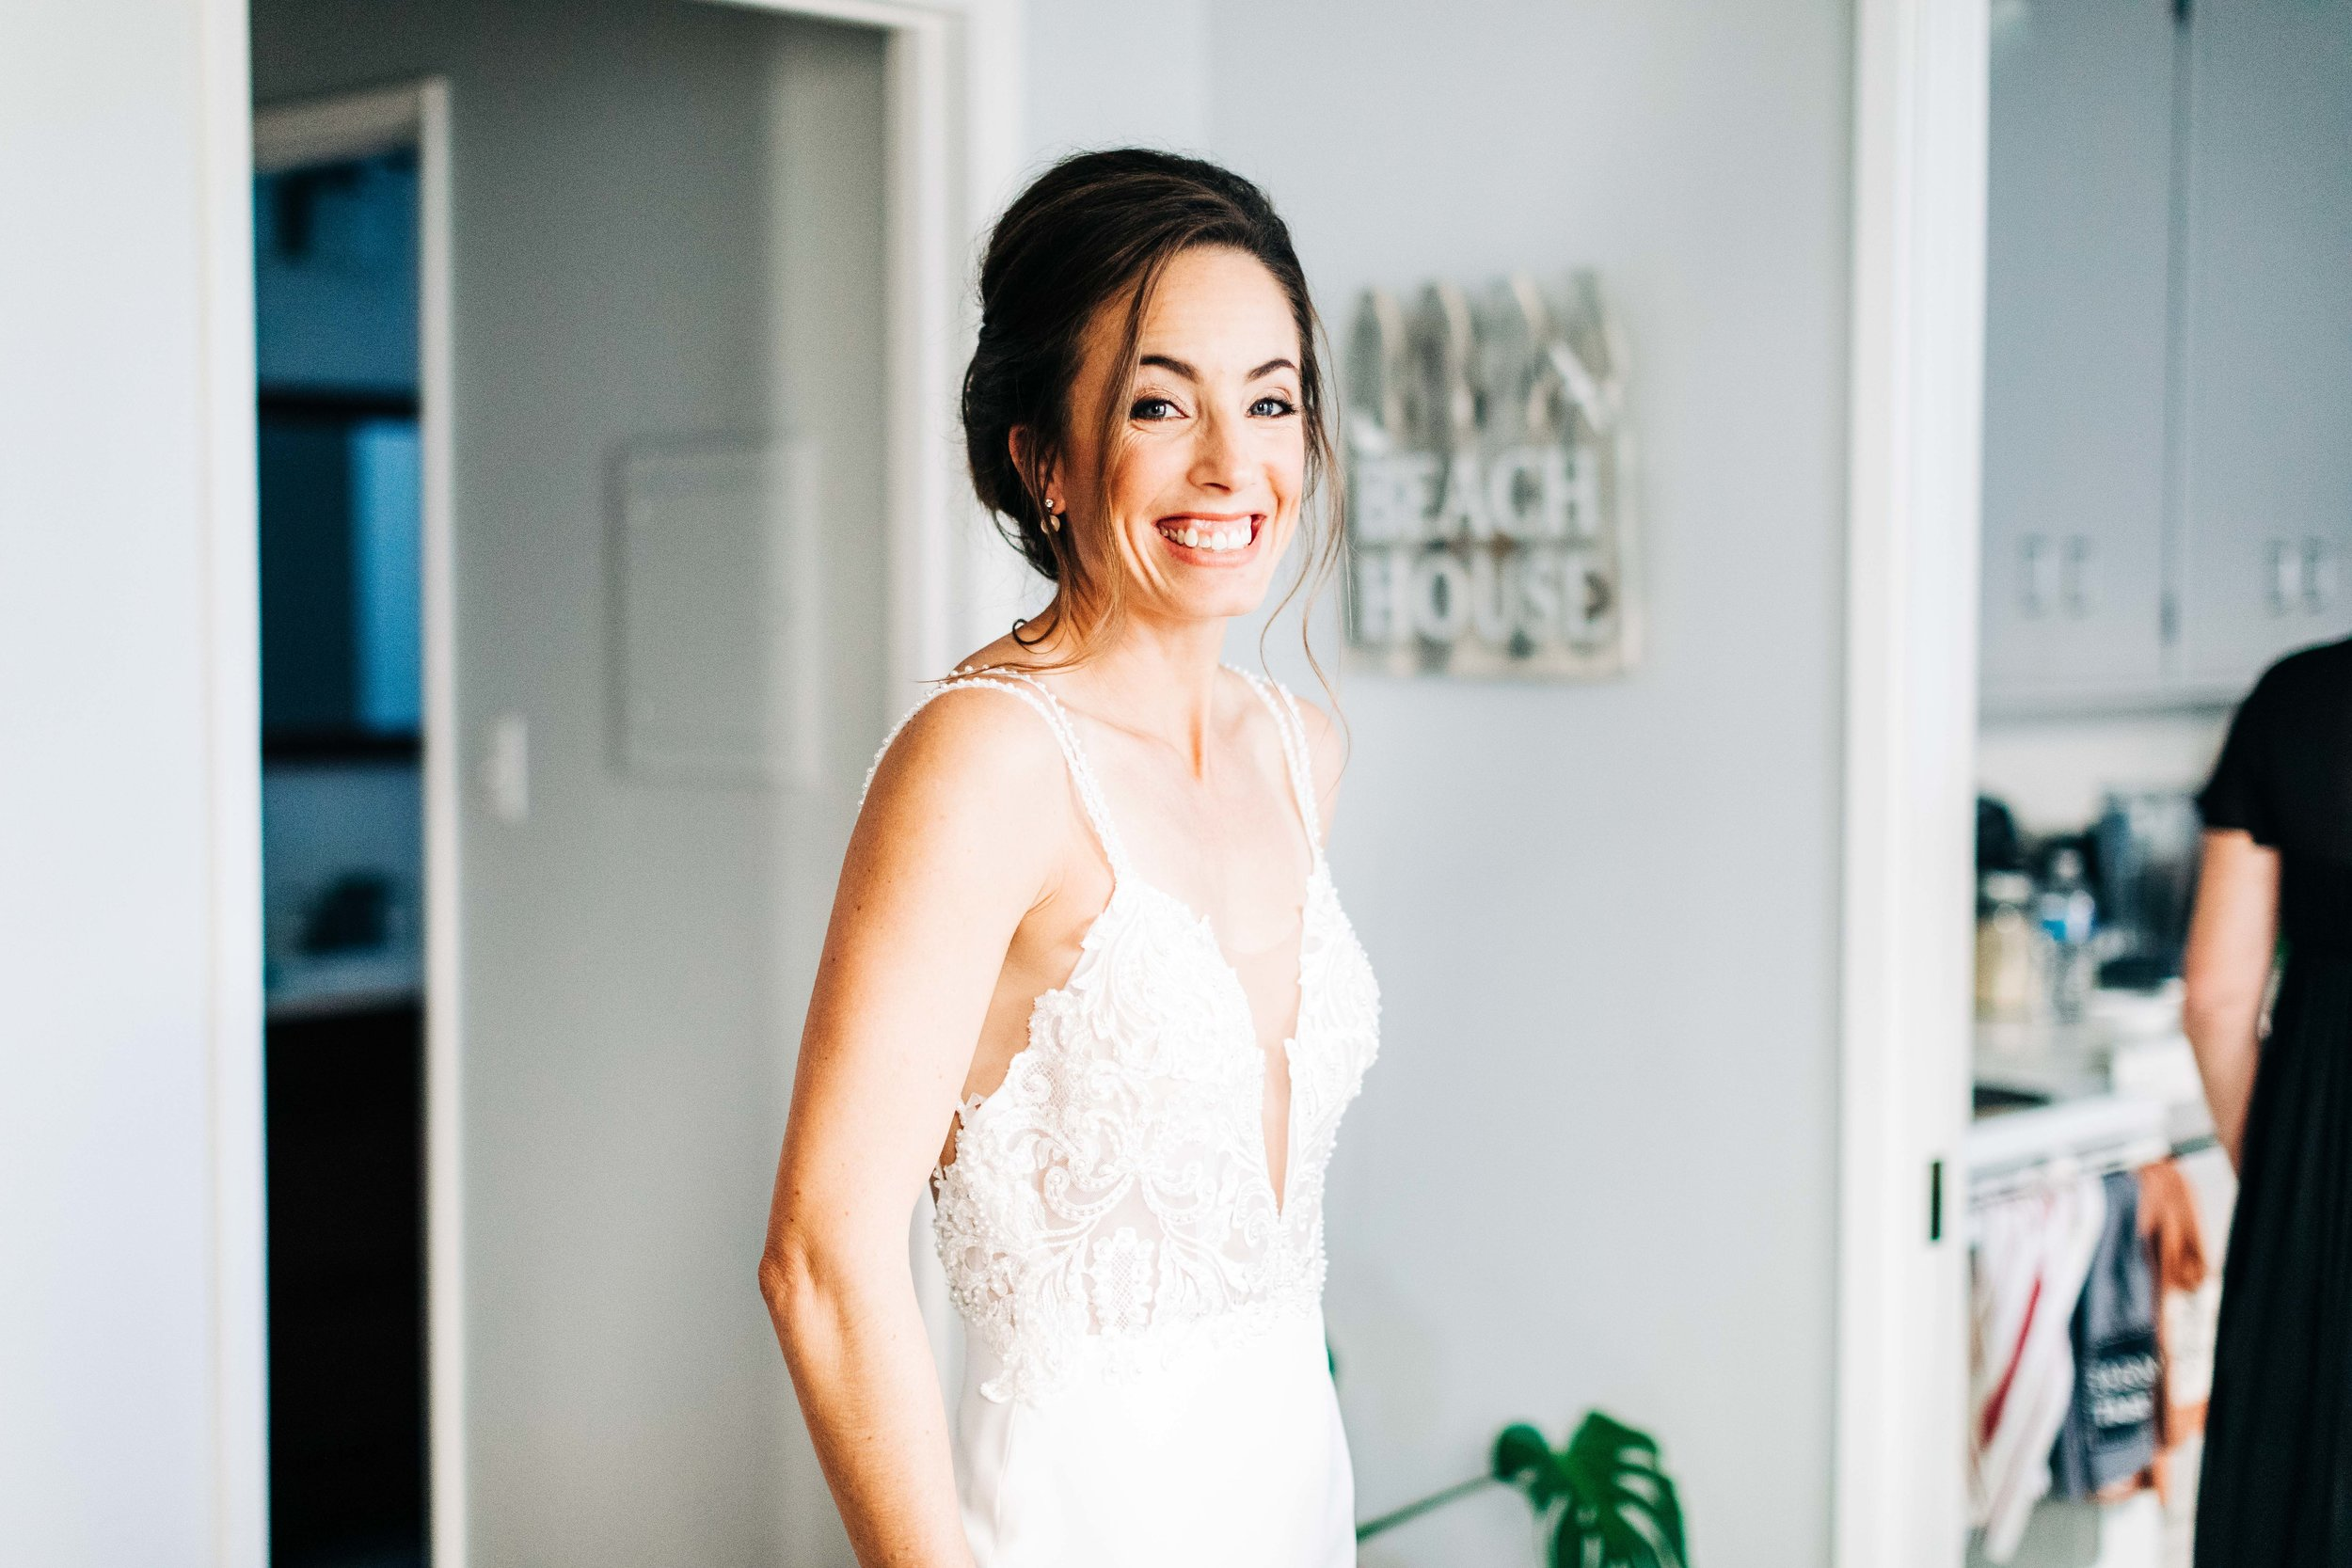 Airbrush makeup for a long beach brides wedding day